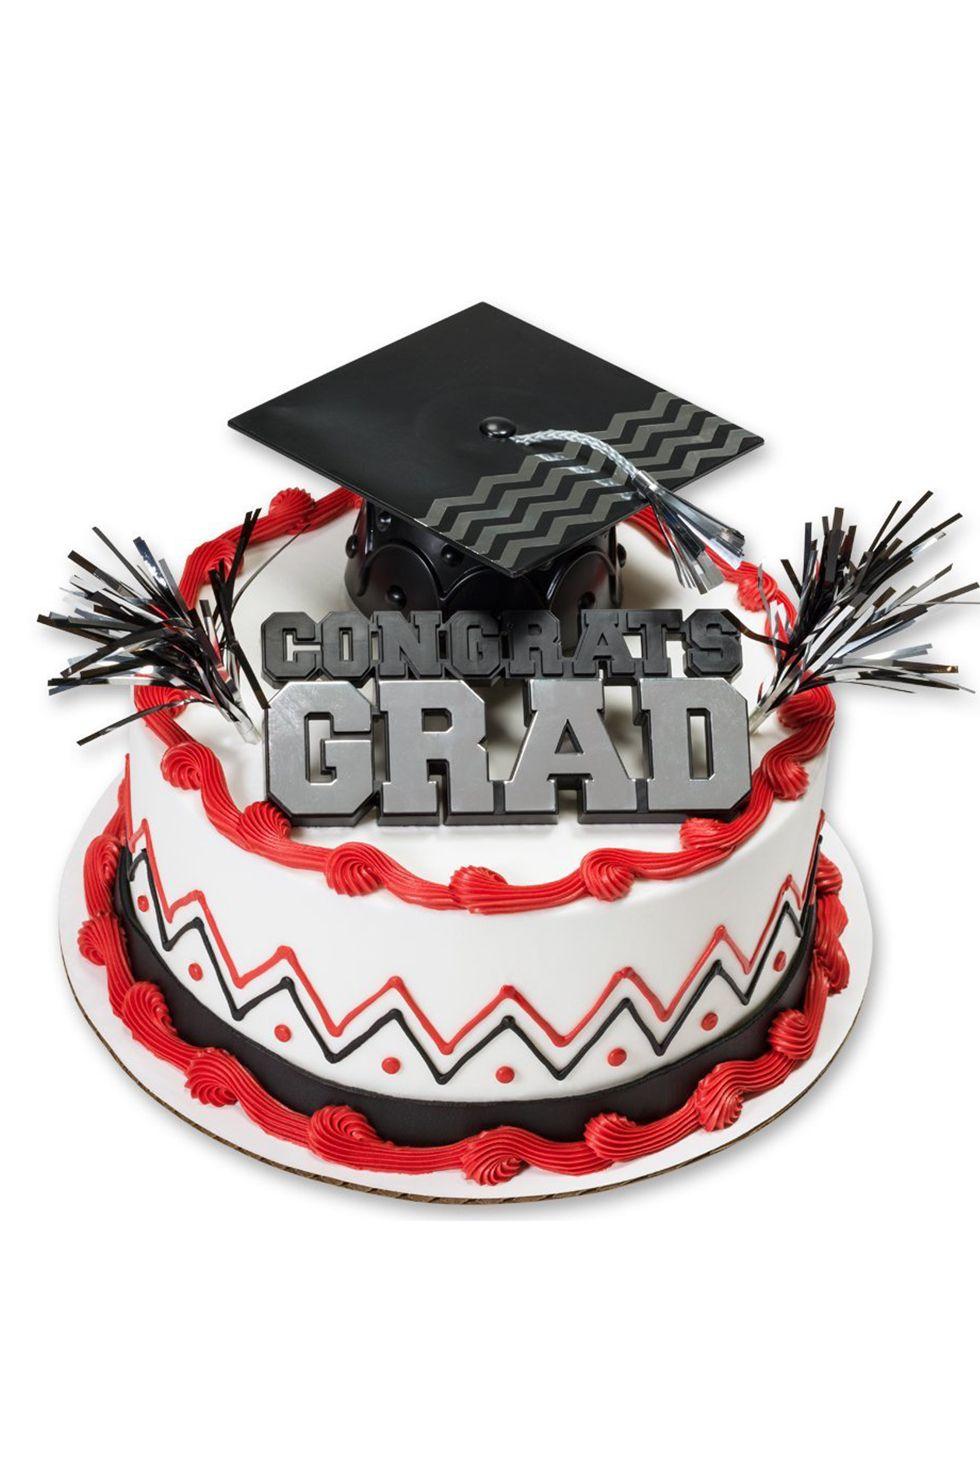 Easy graduation cake ideas decorations for high school